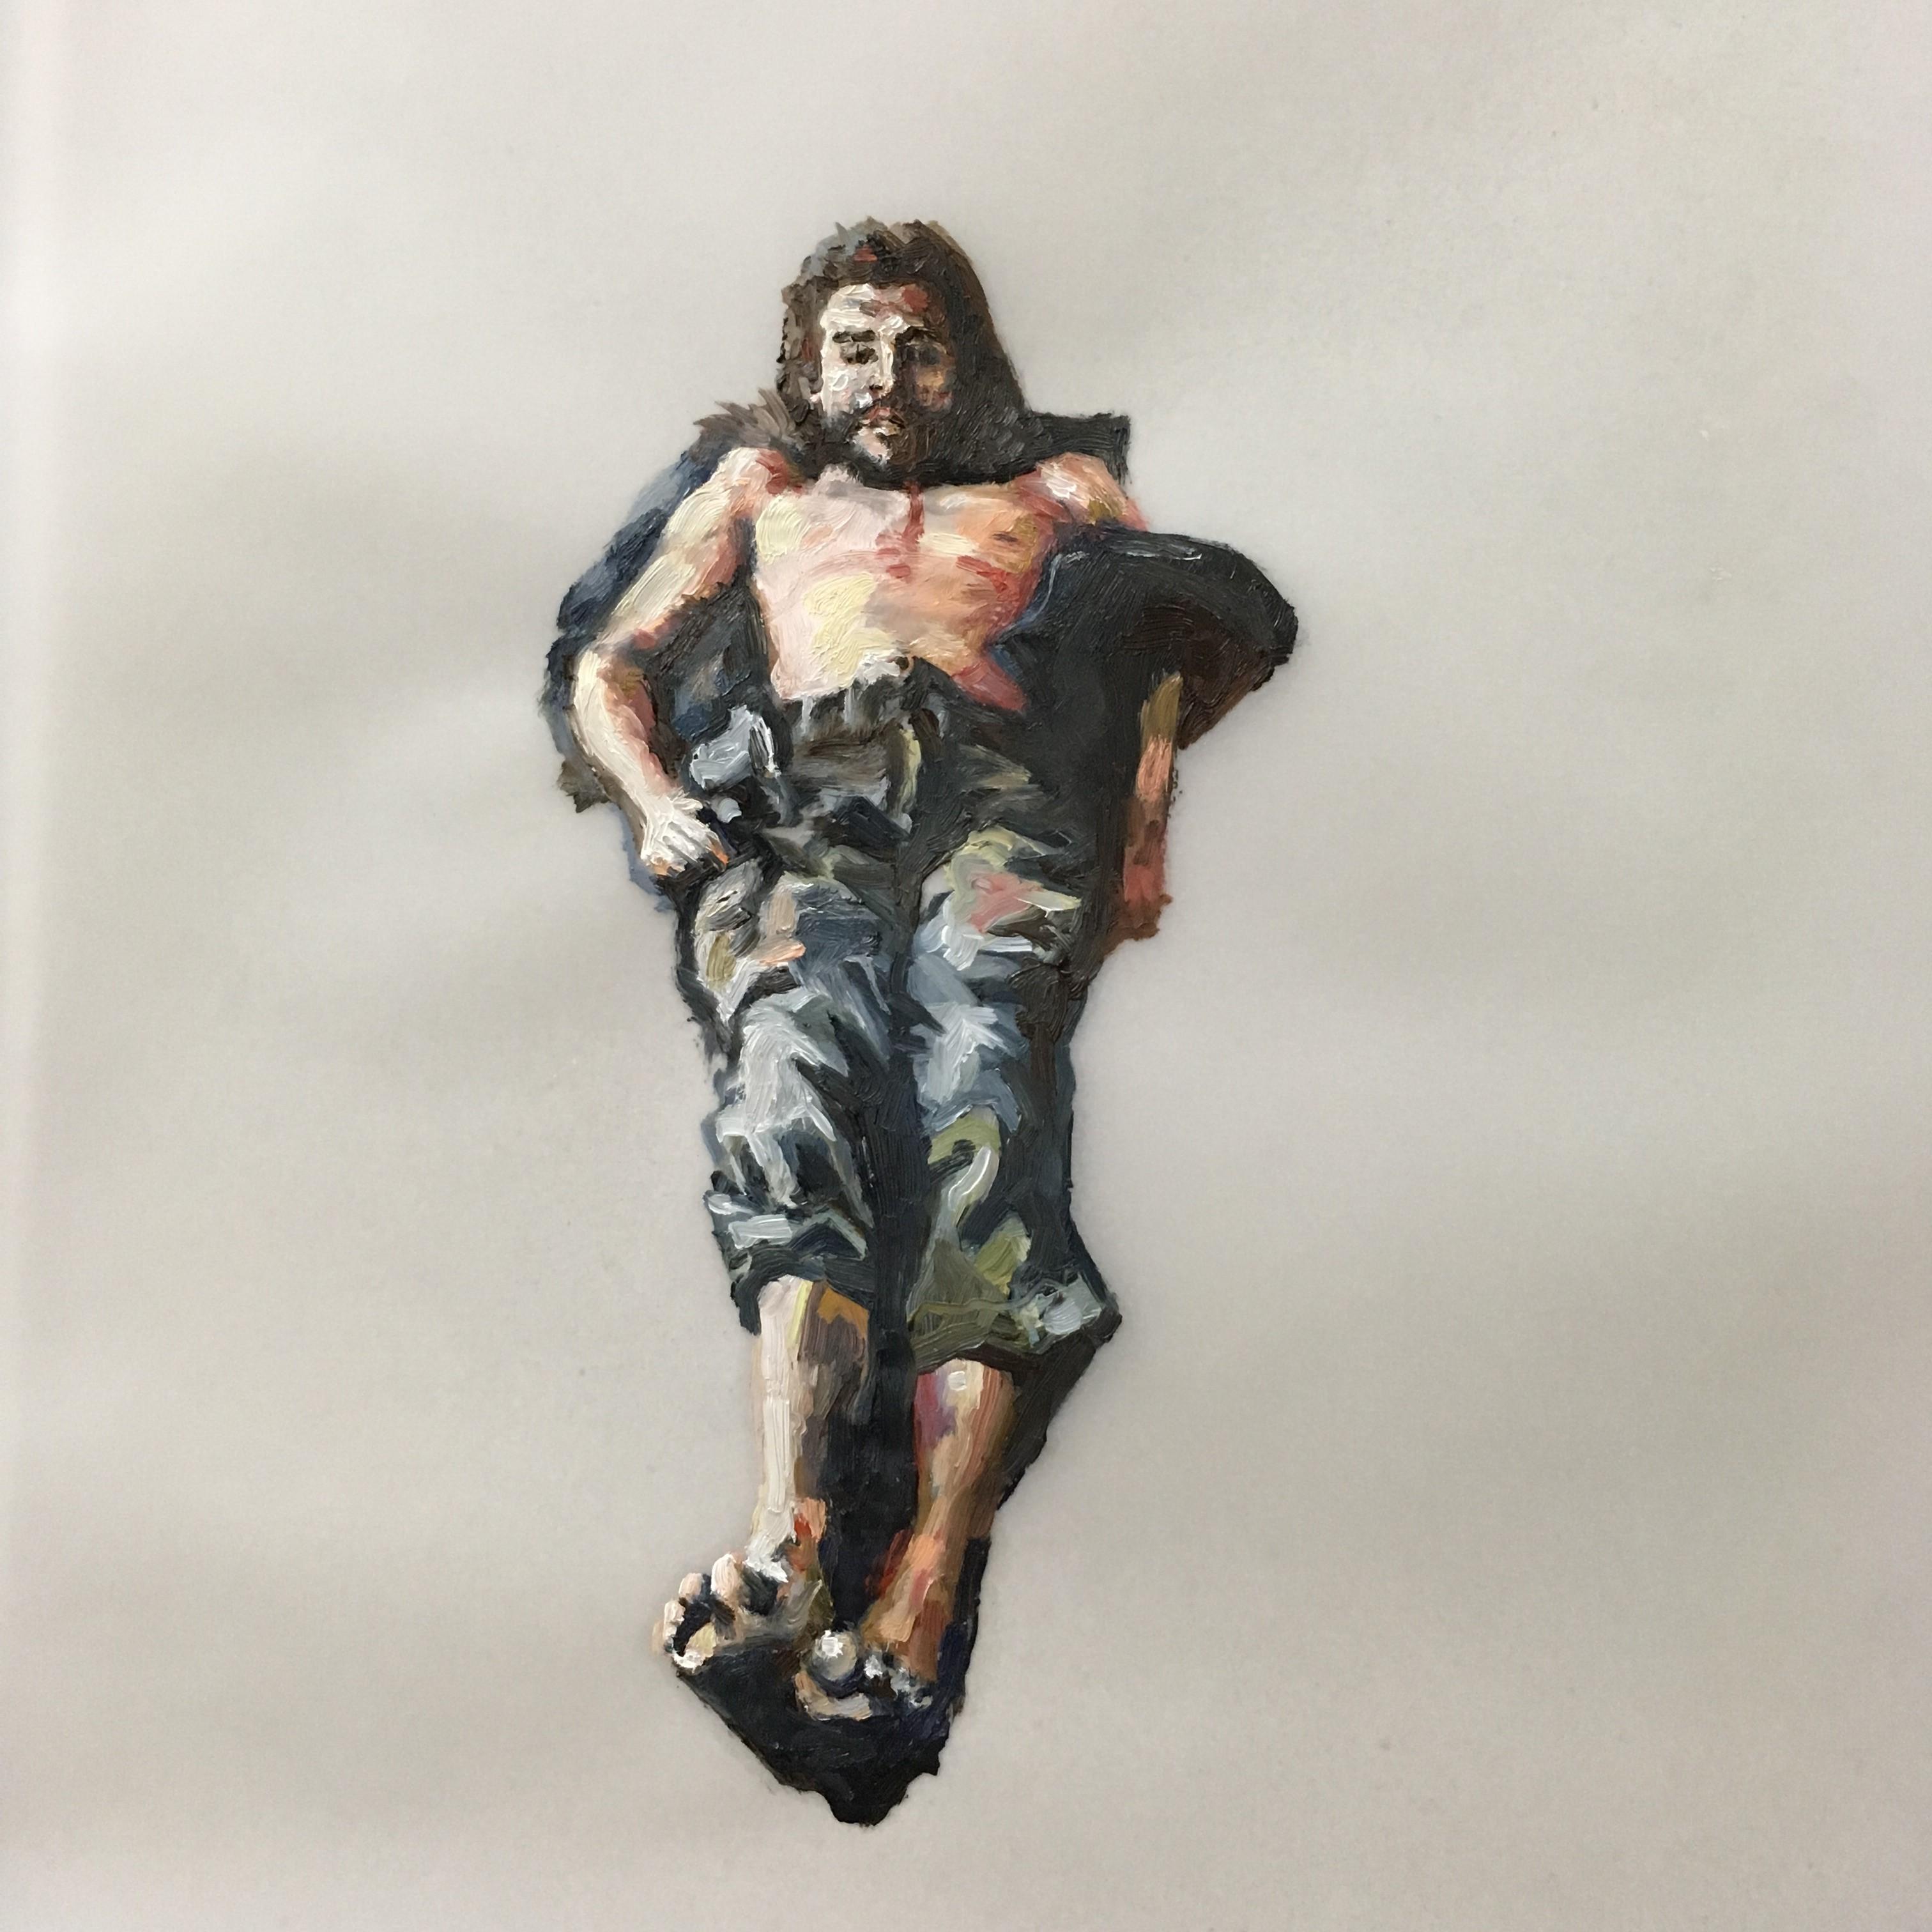 Forgotten Casualty: Che Guevara